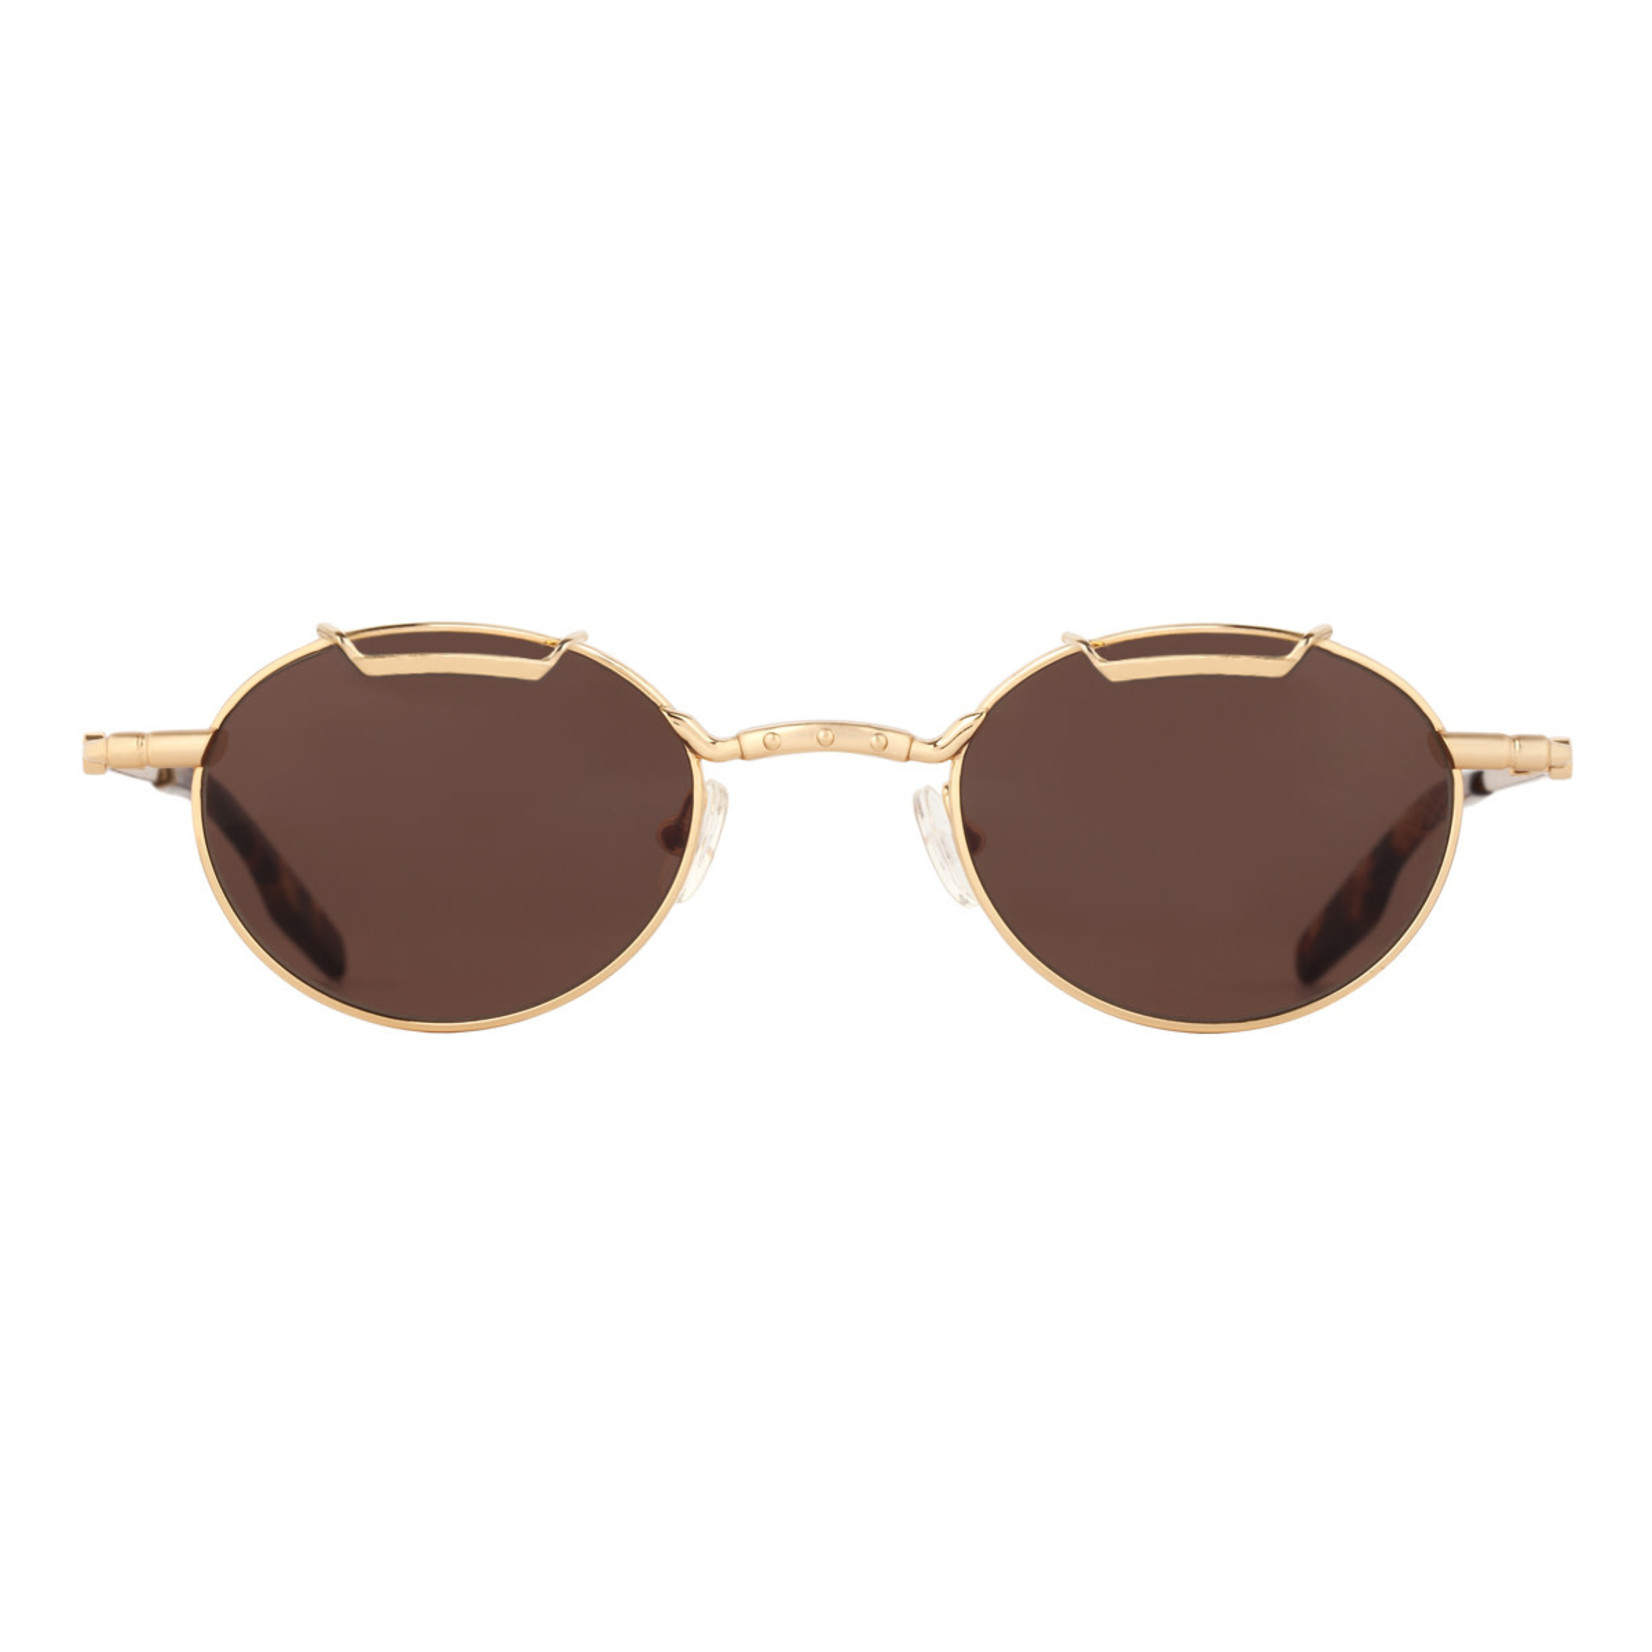 Amber Sceats Joey Sunglasses